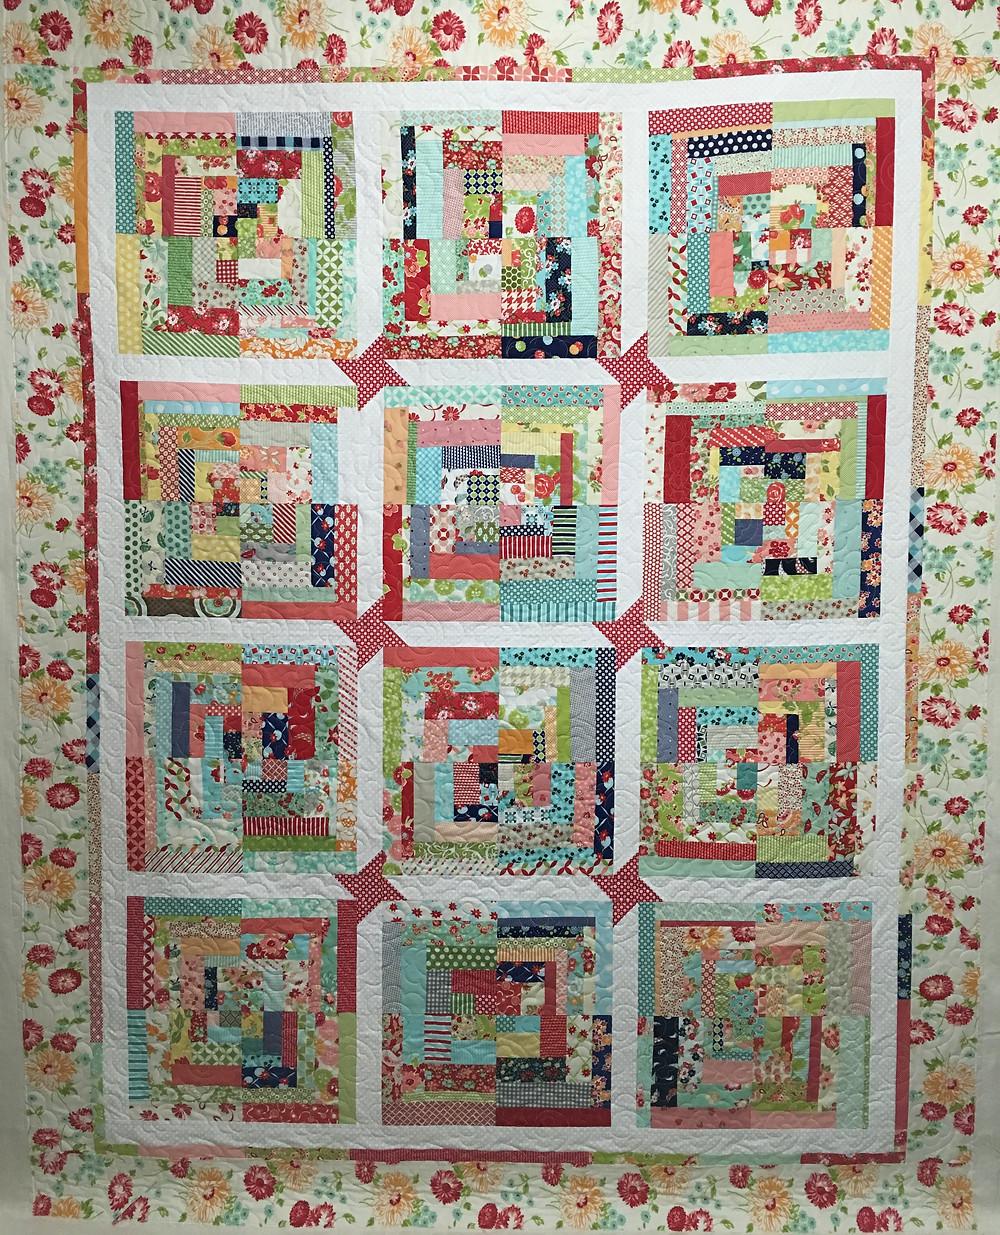 Deb Scrappy Christmas Block quilt in bright colors